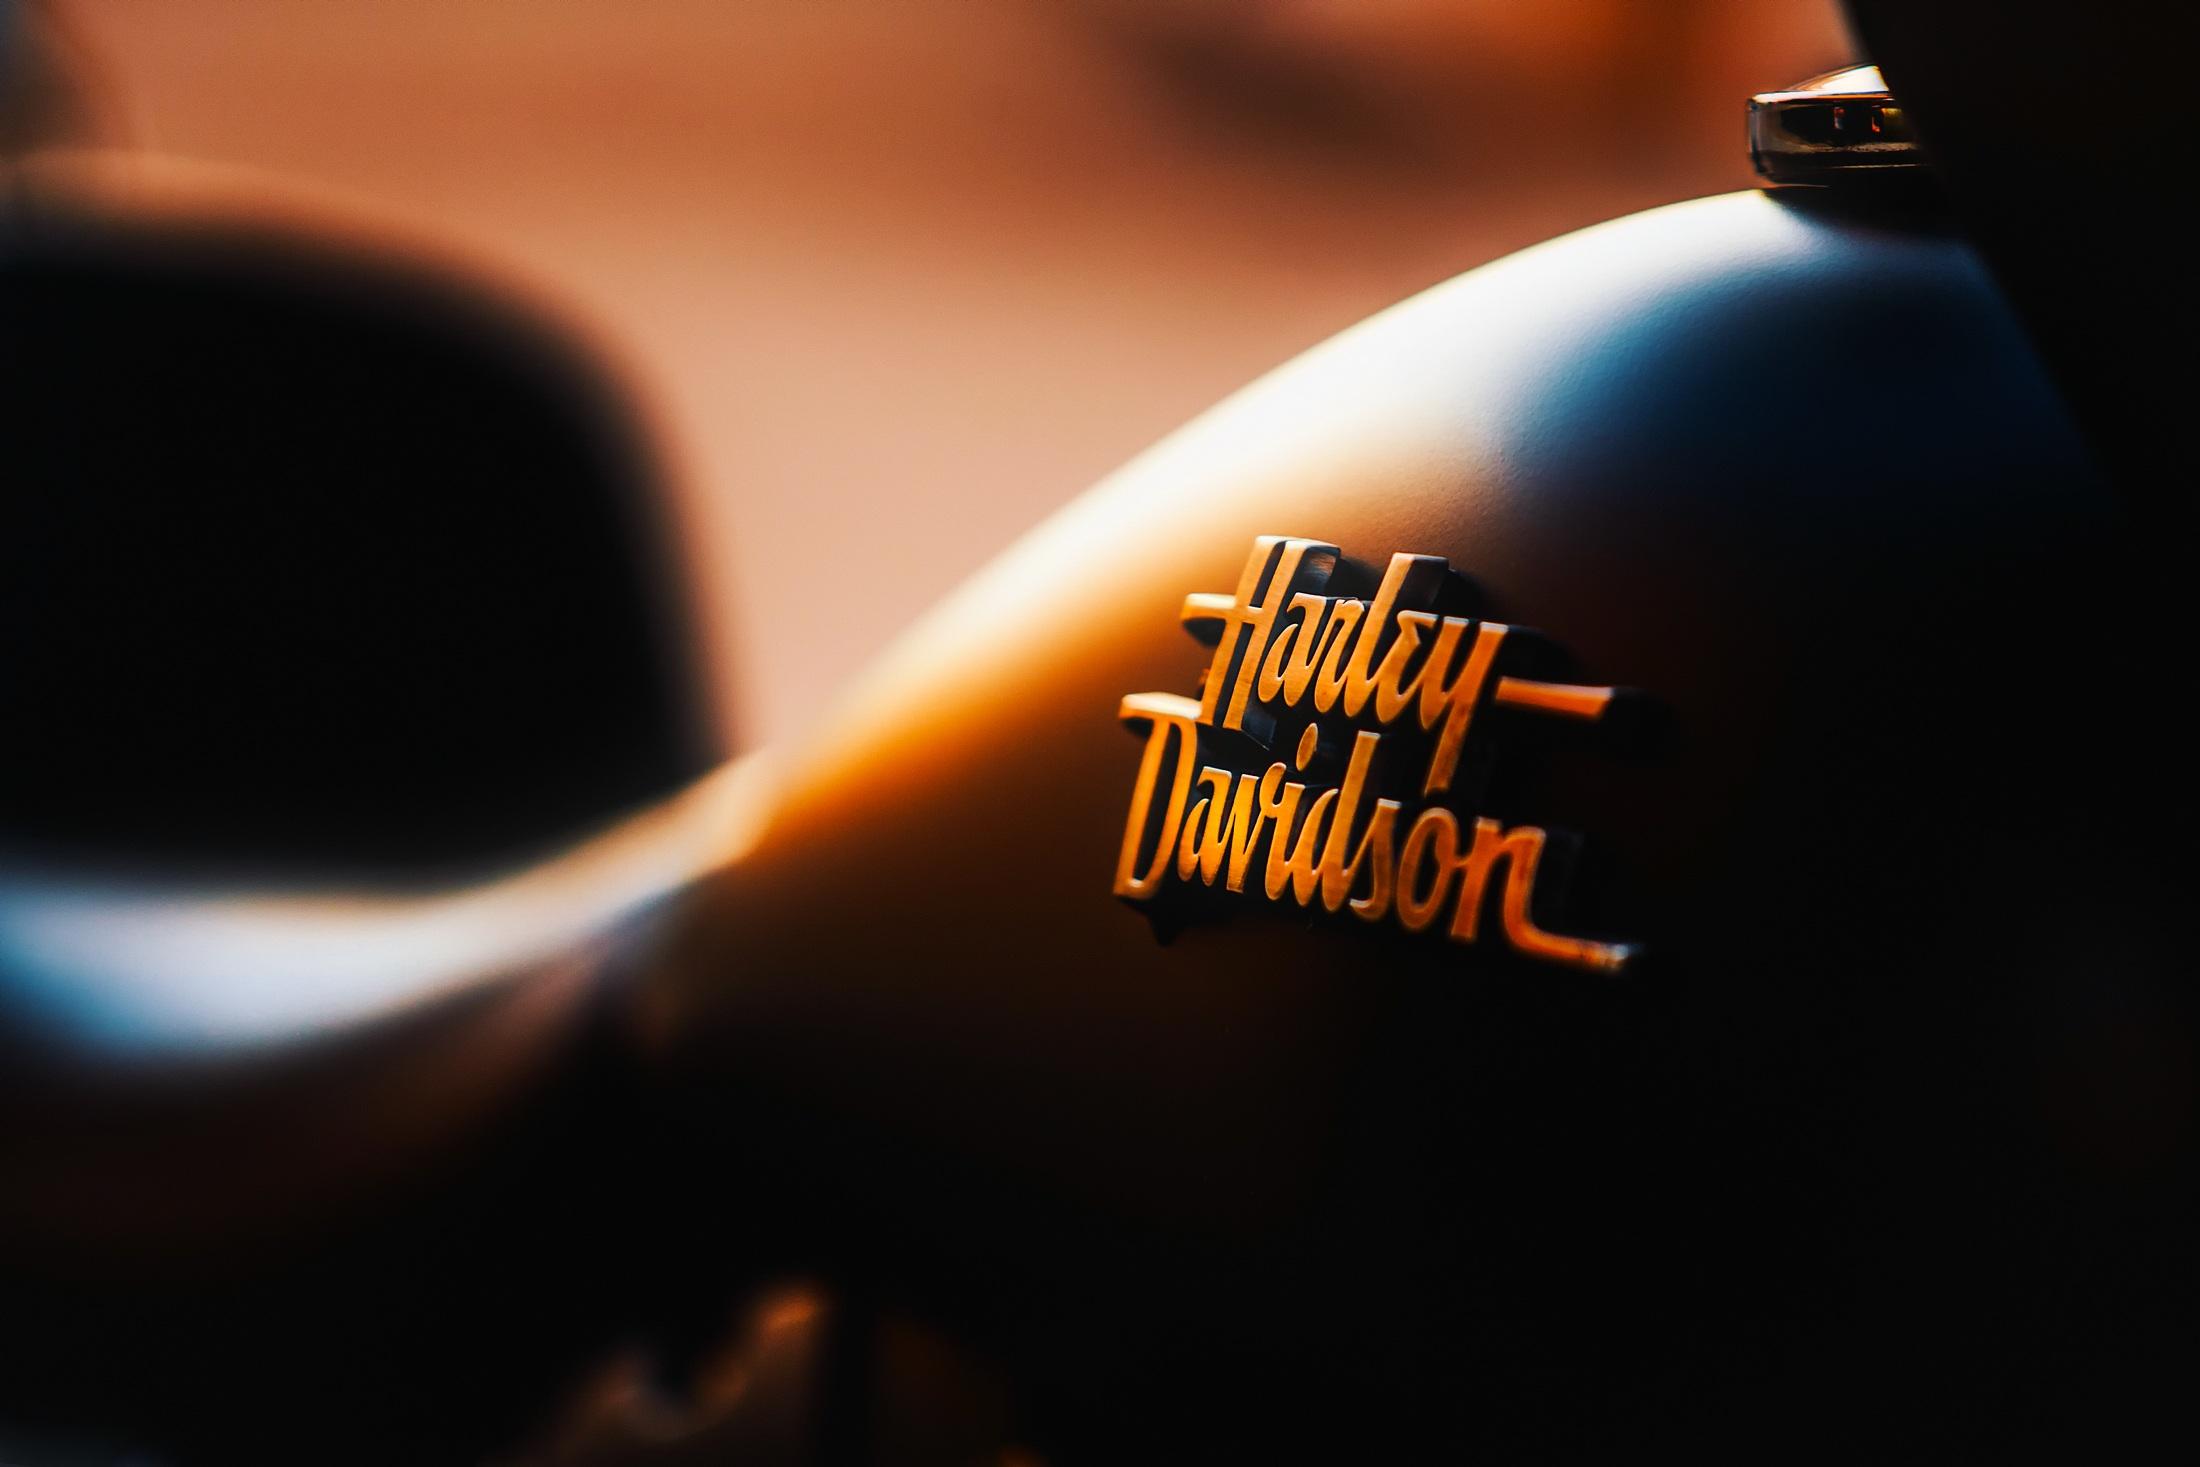 Harley Davidson Logo Bike, HD Bikes, 4k Wallpapers, Images.